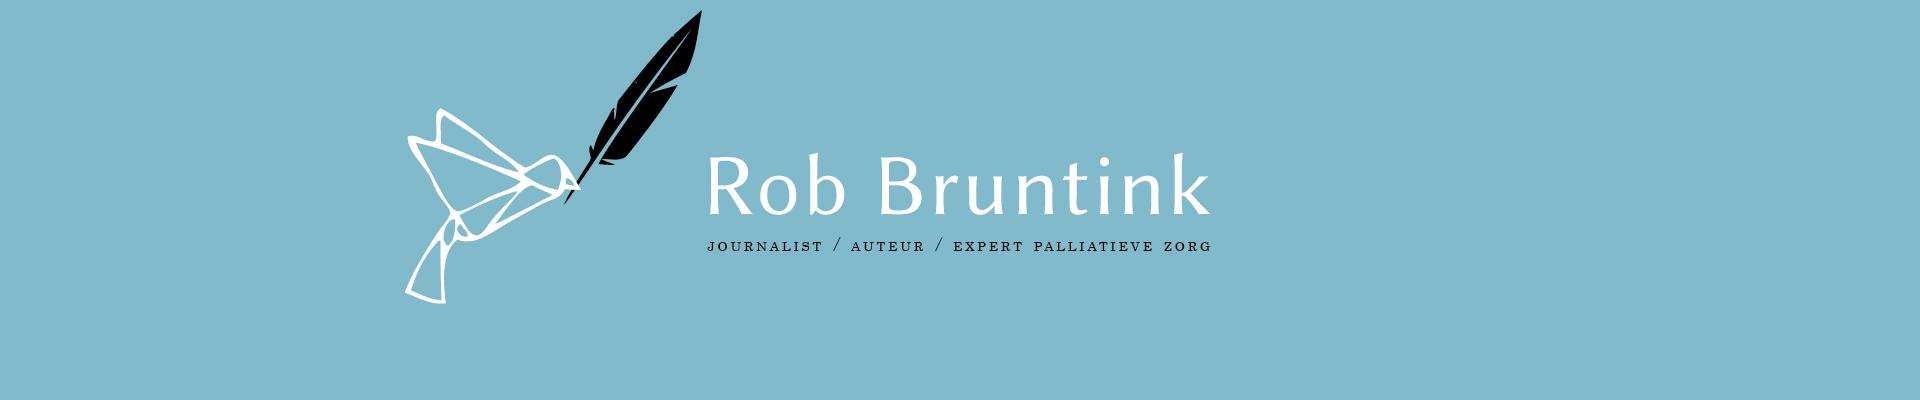 Rob Bruntink